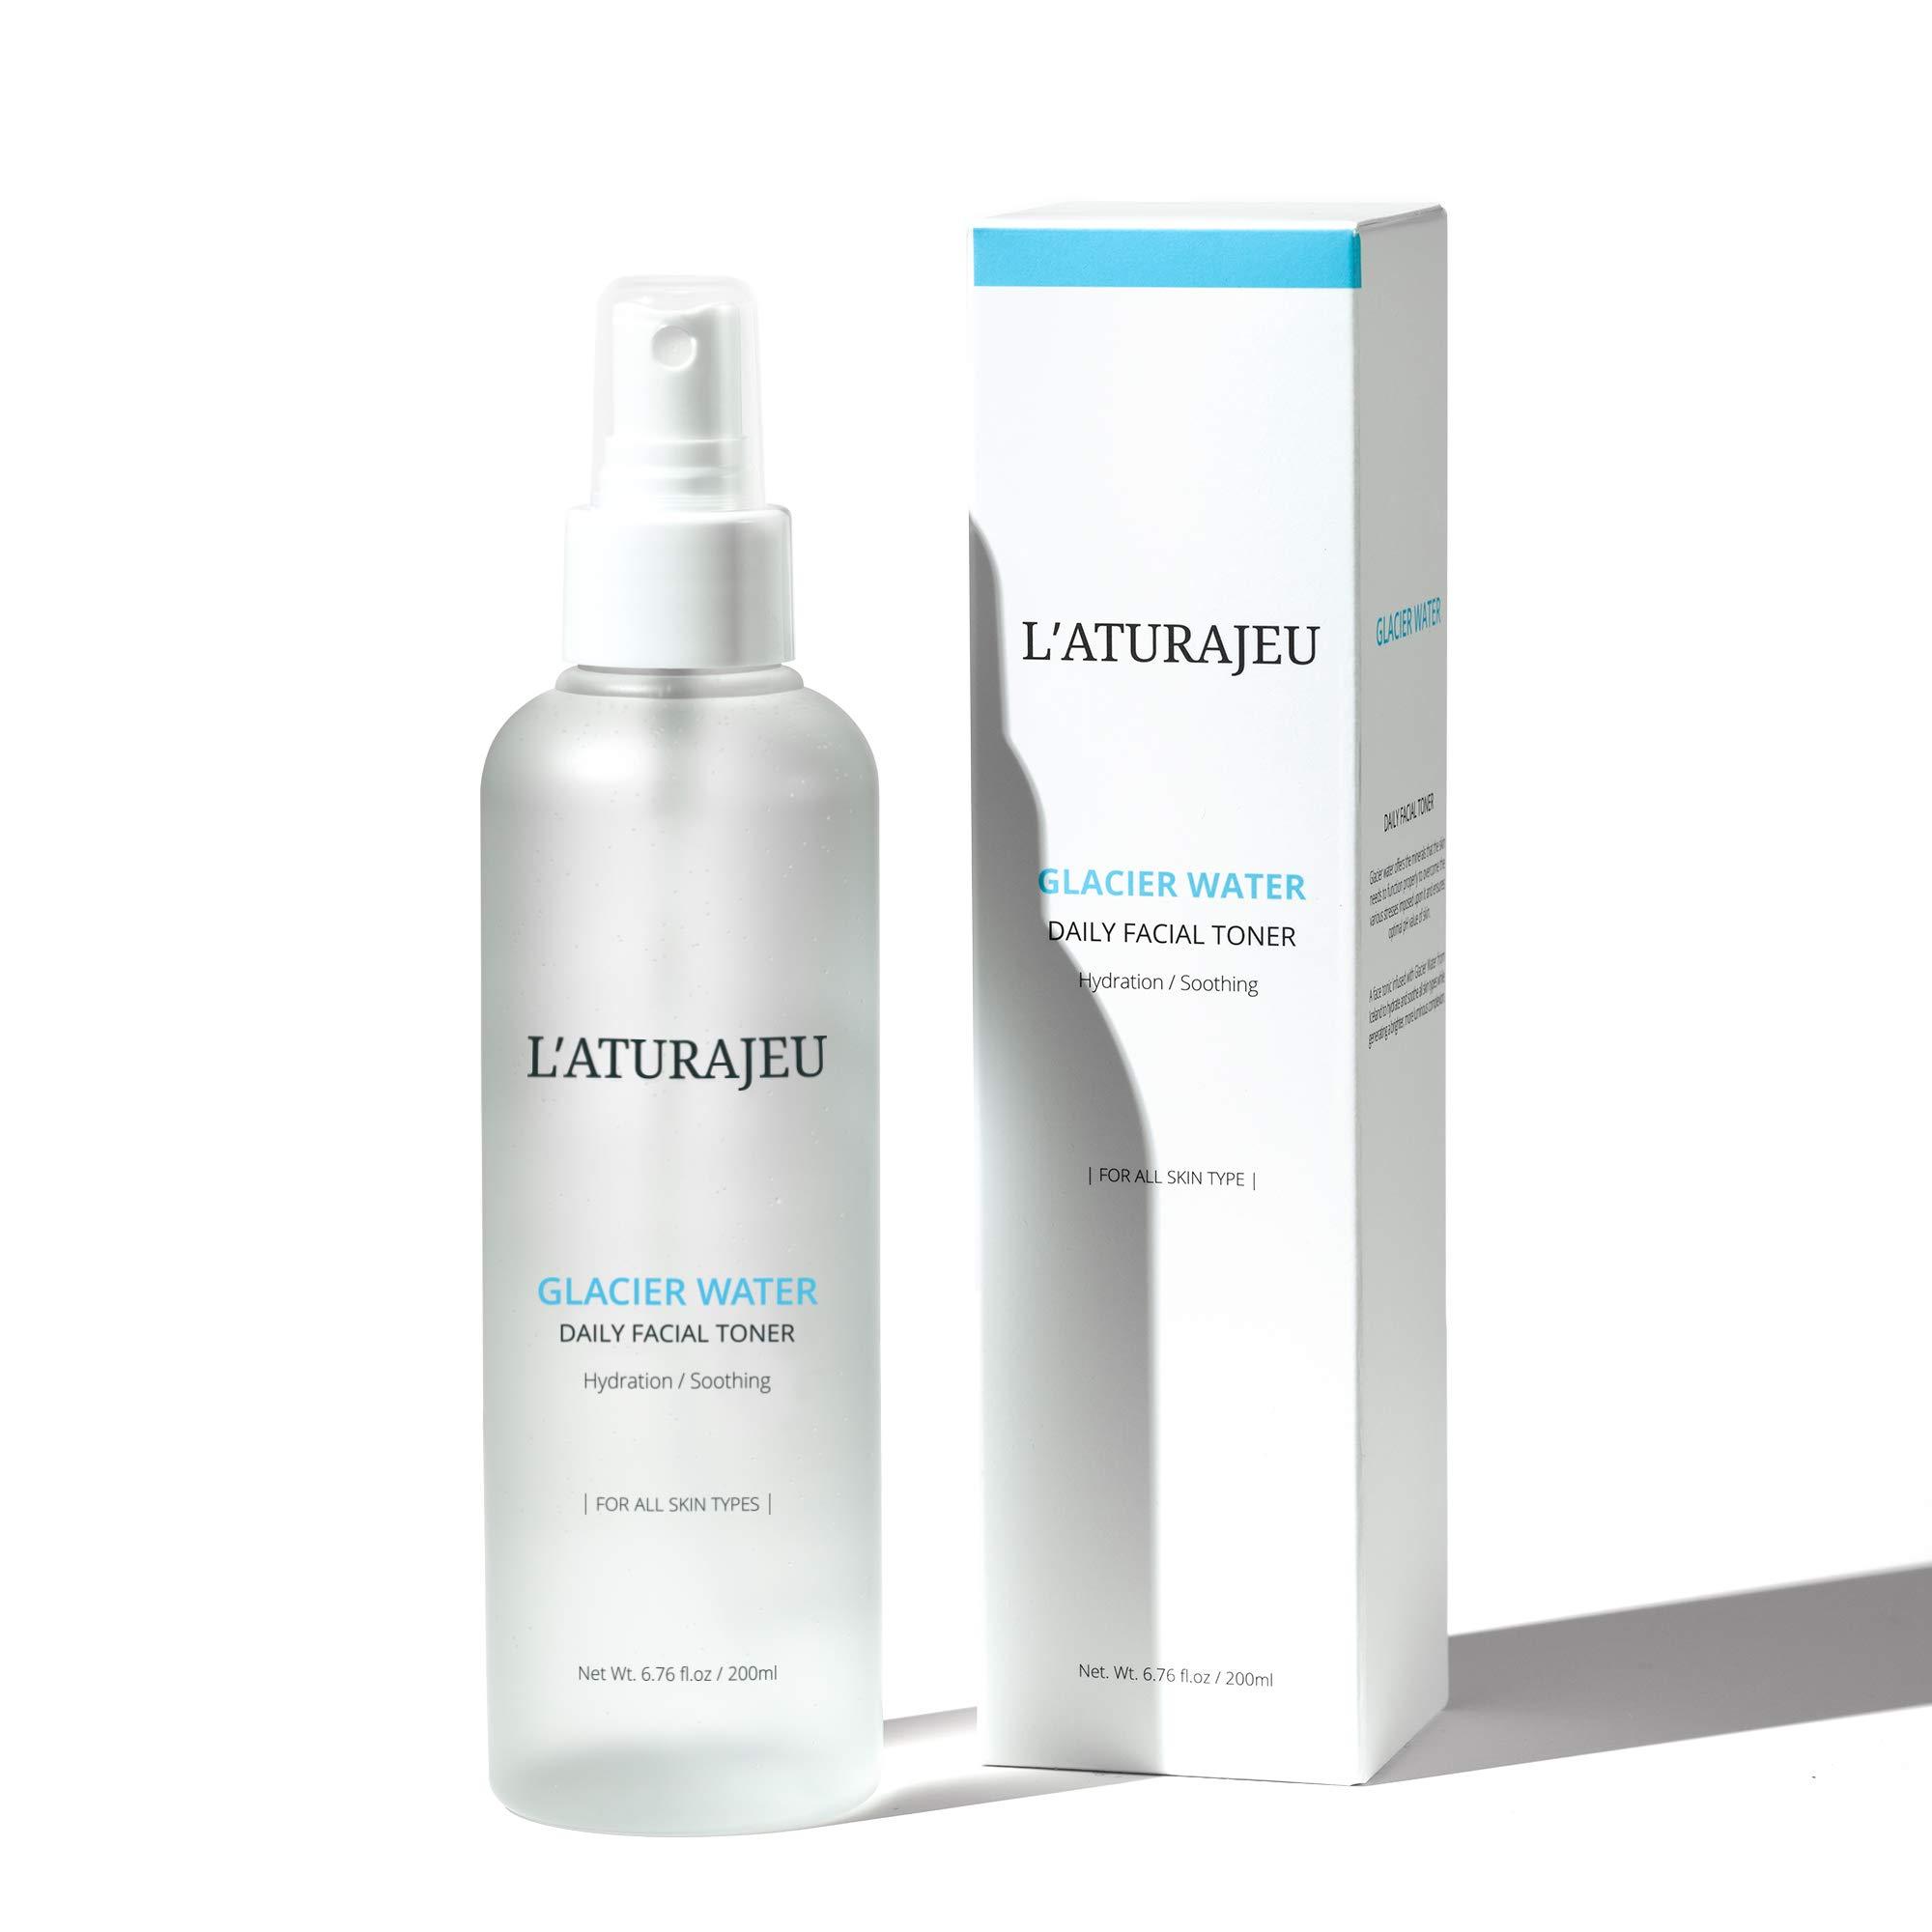 L'ATURAJEU 10-Free Korean Facial Toner Spray with Glacier Water (No Scent), for All Skin Types (6.76 fl.oz) by L'ATURAJEU